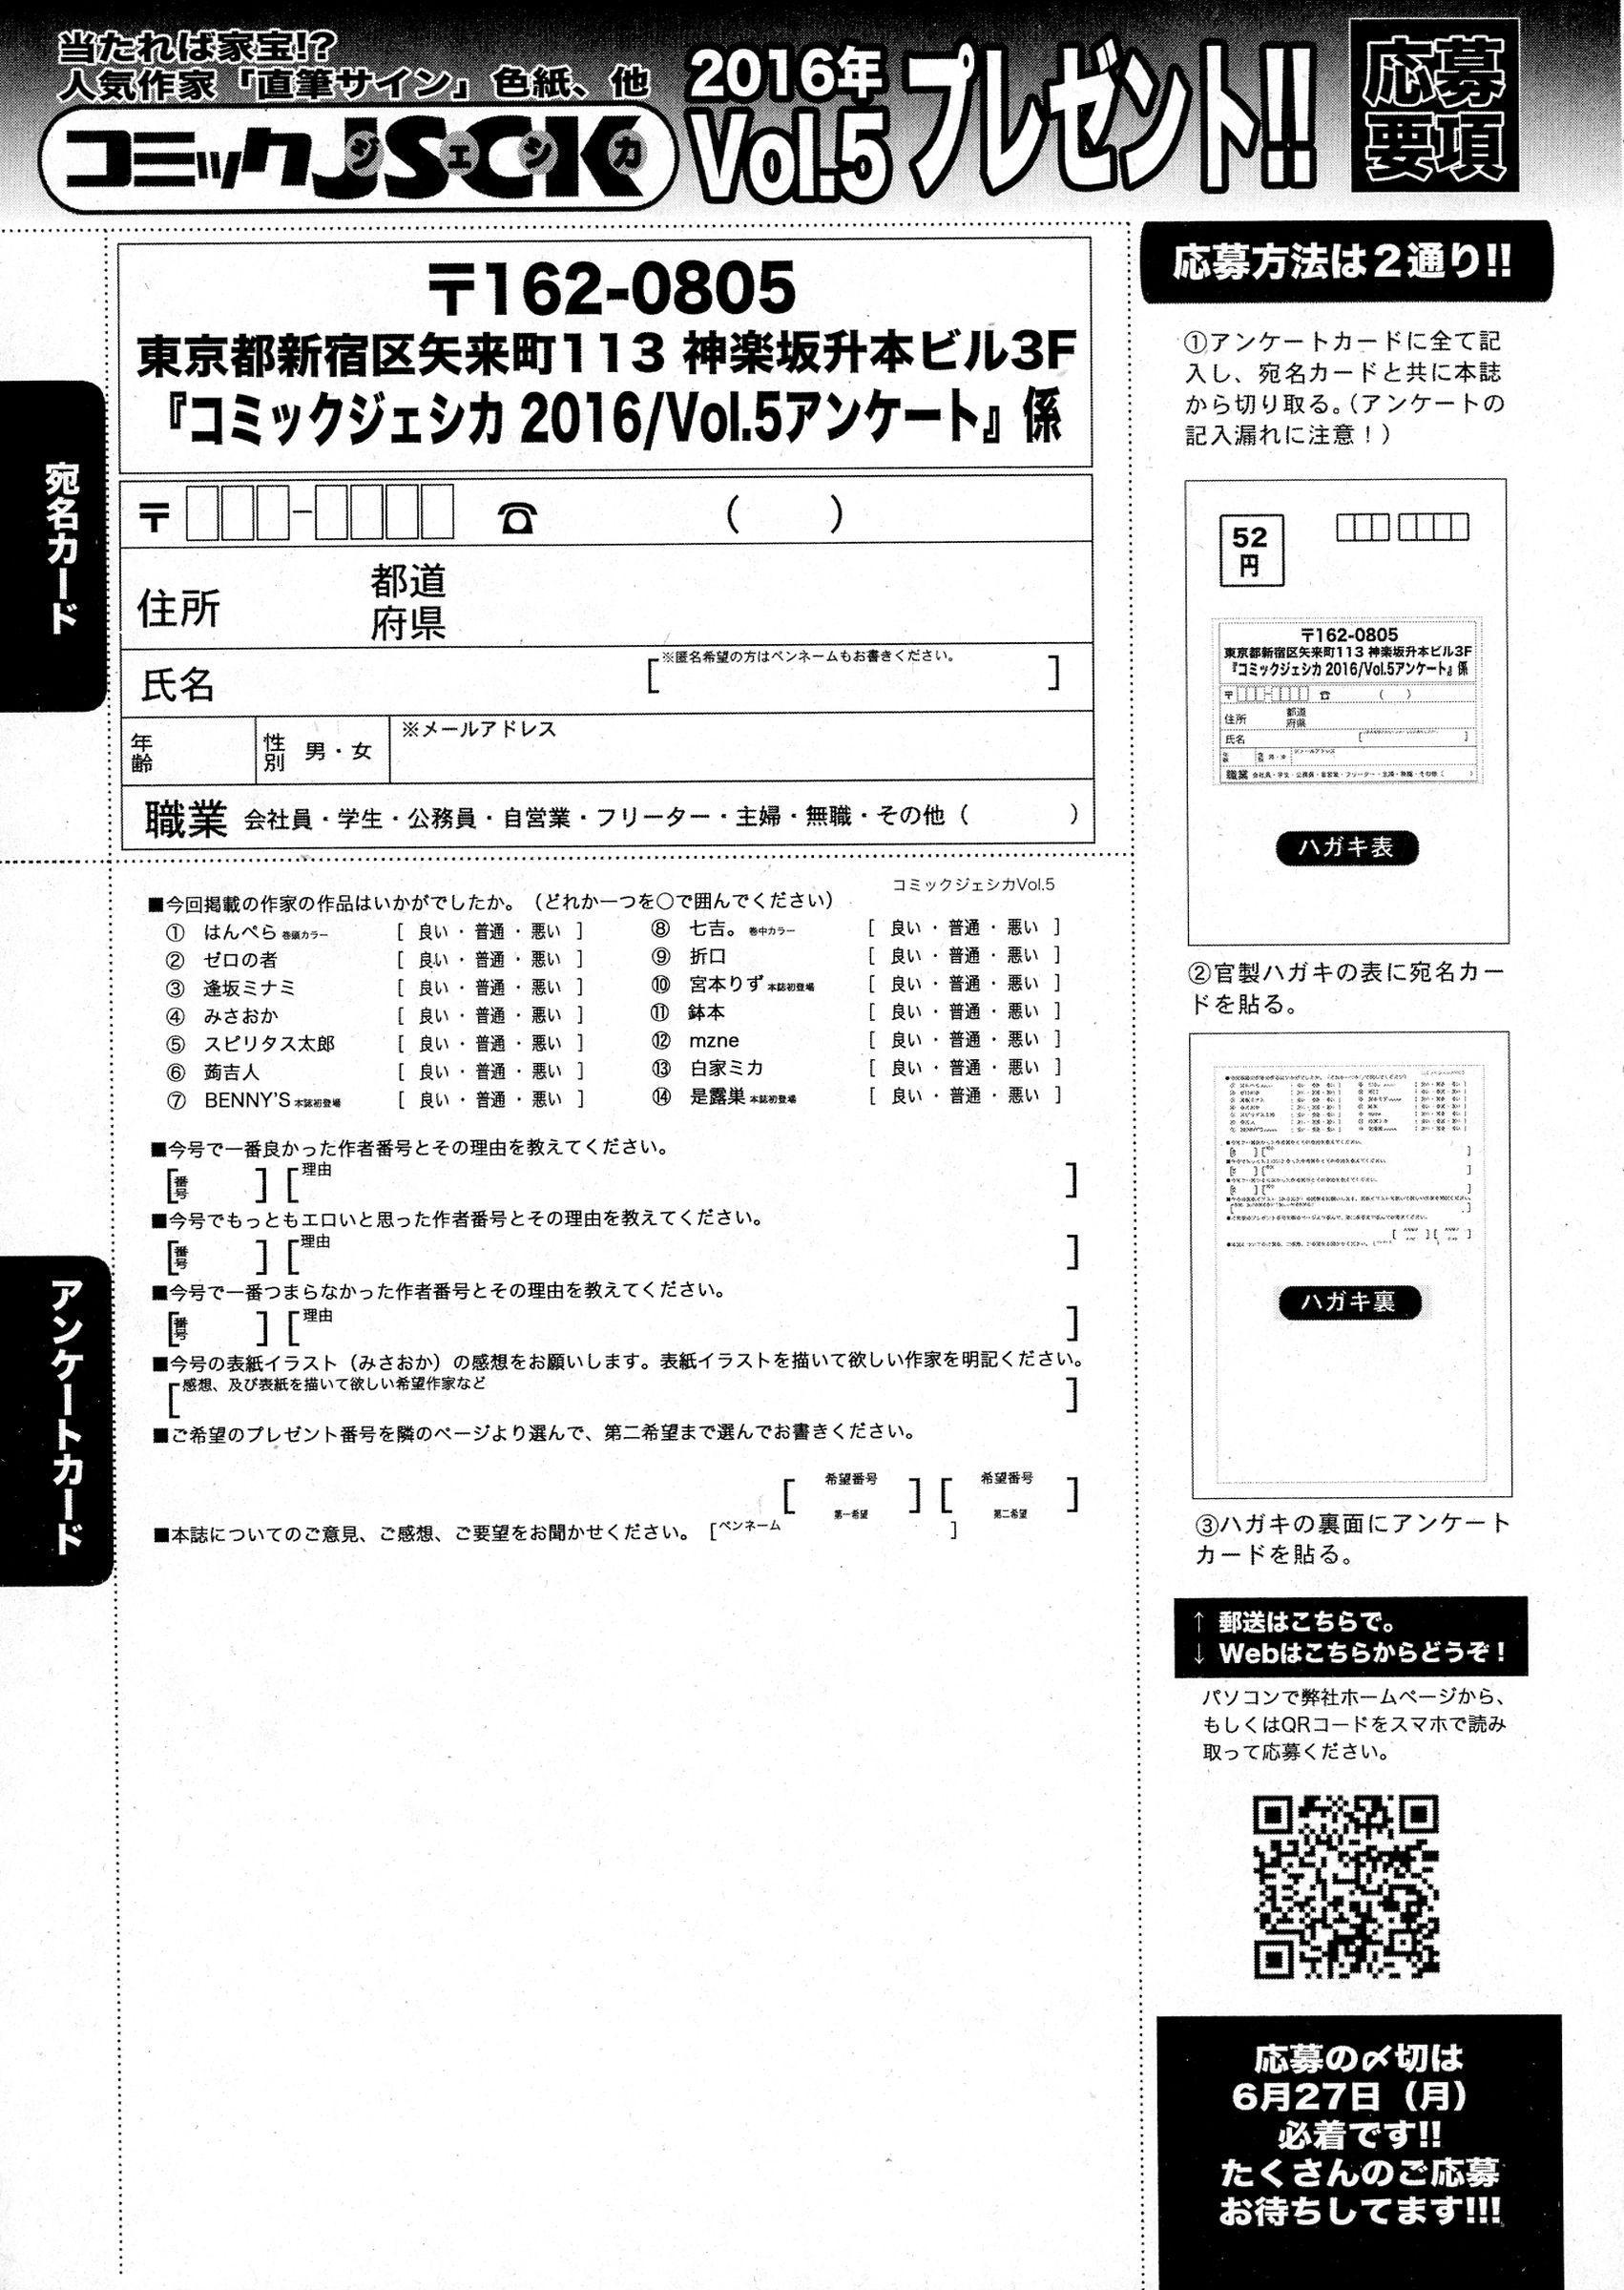 COMIC JSCK Vol. 5 270